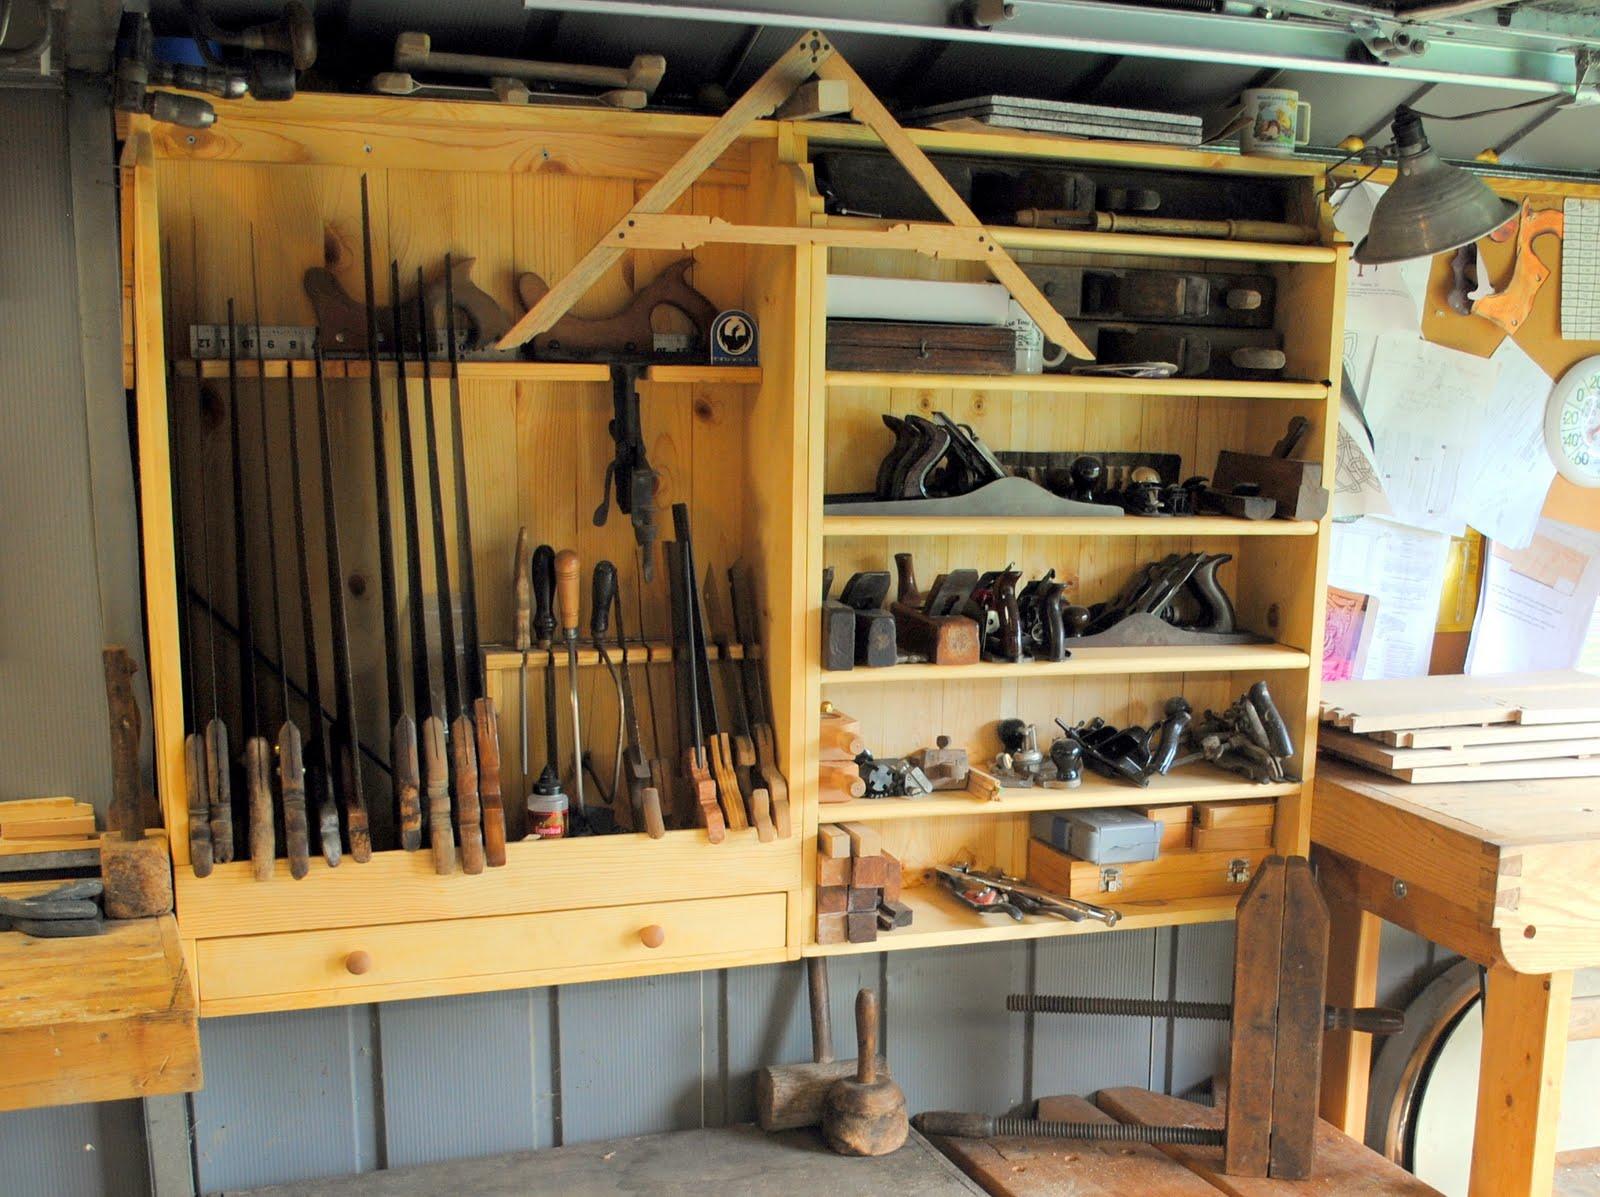 & Final Pictures: Plane Storage Shelf